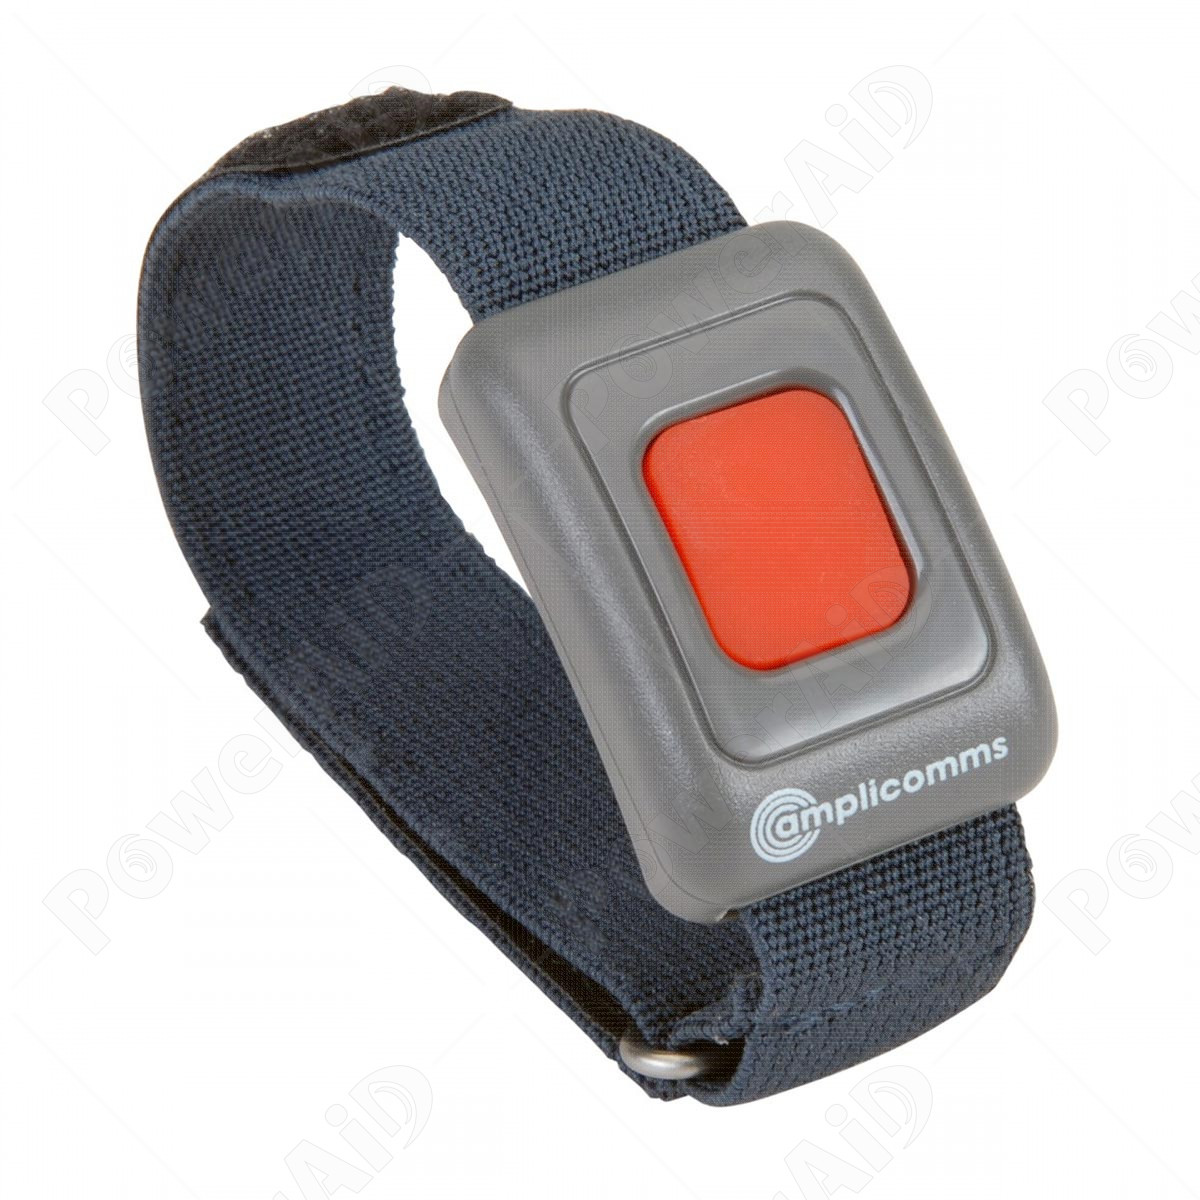 Amplicomms - PowerTel 97 Cinturino Wireless allarme SOS